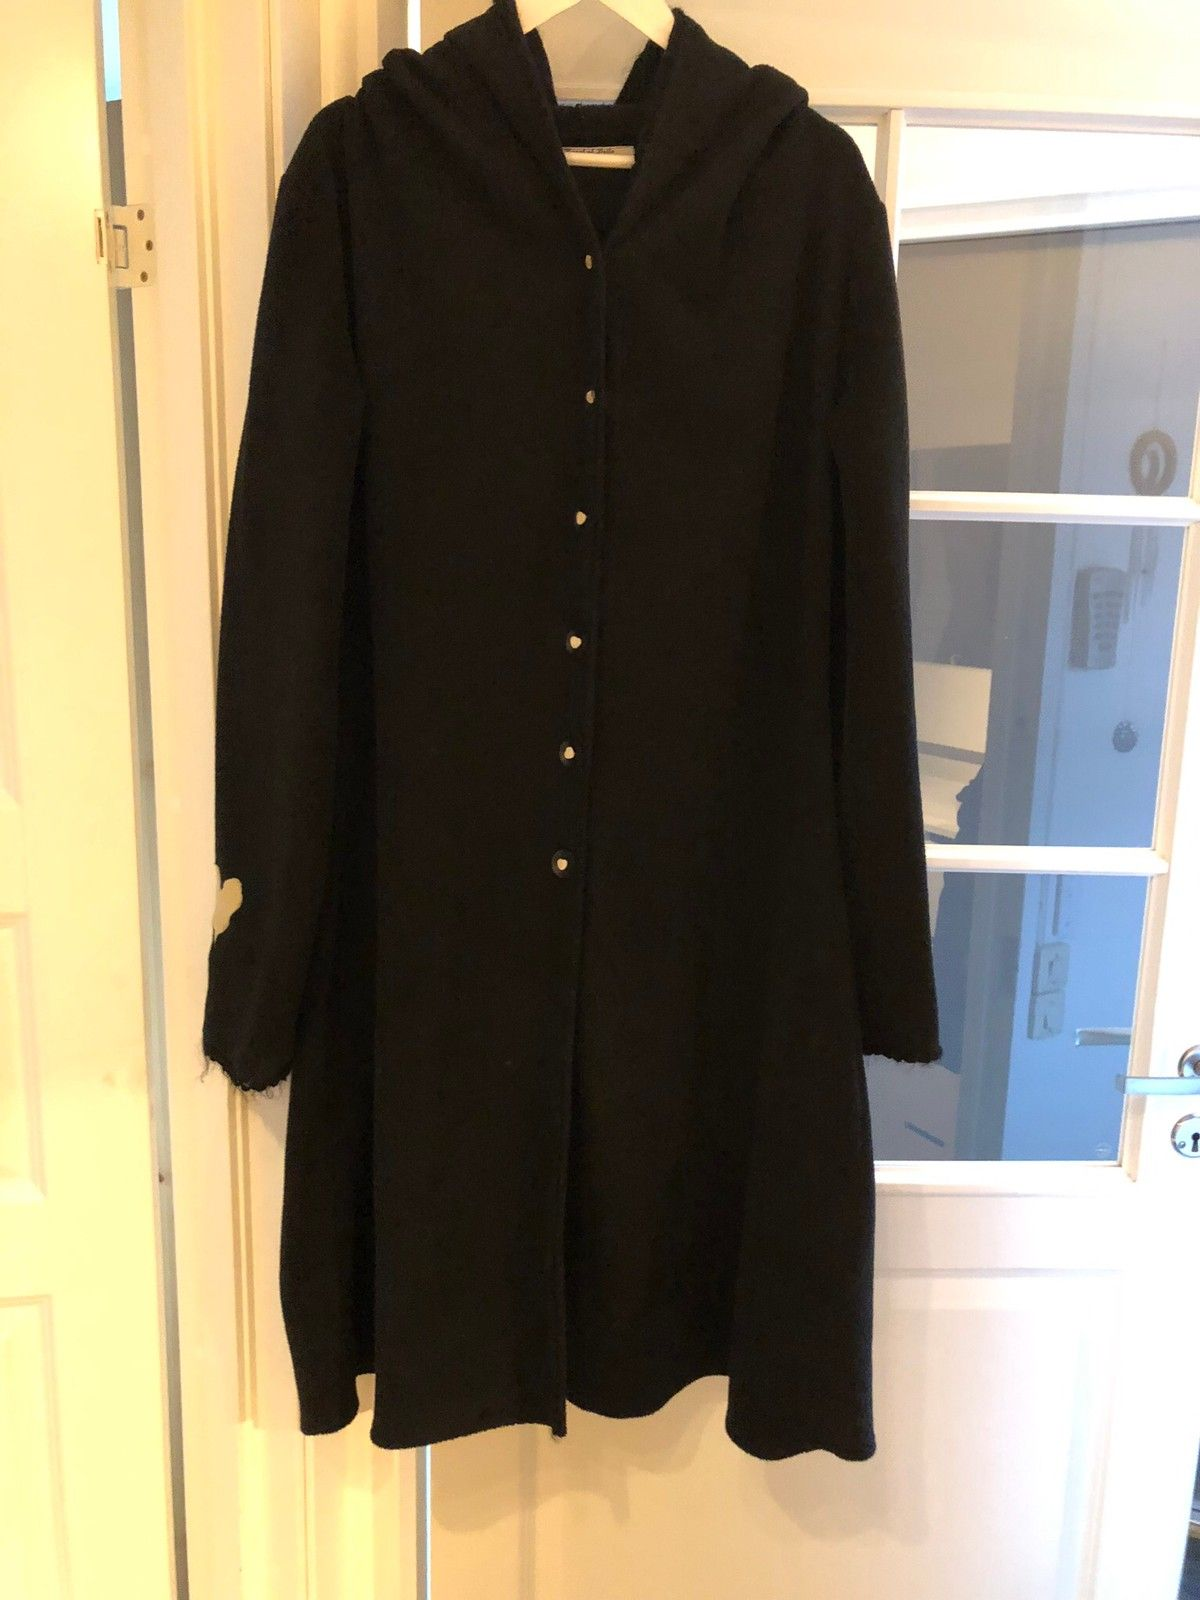 f3dfc65c Nydelig kåpe i sort fleece | FINN.no